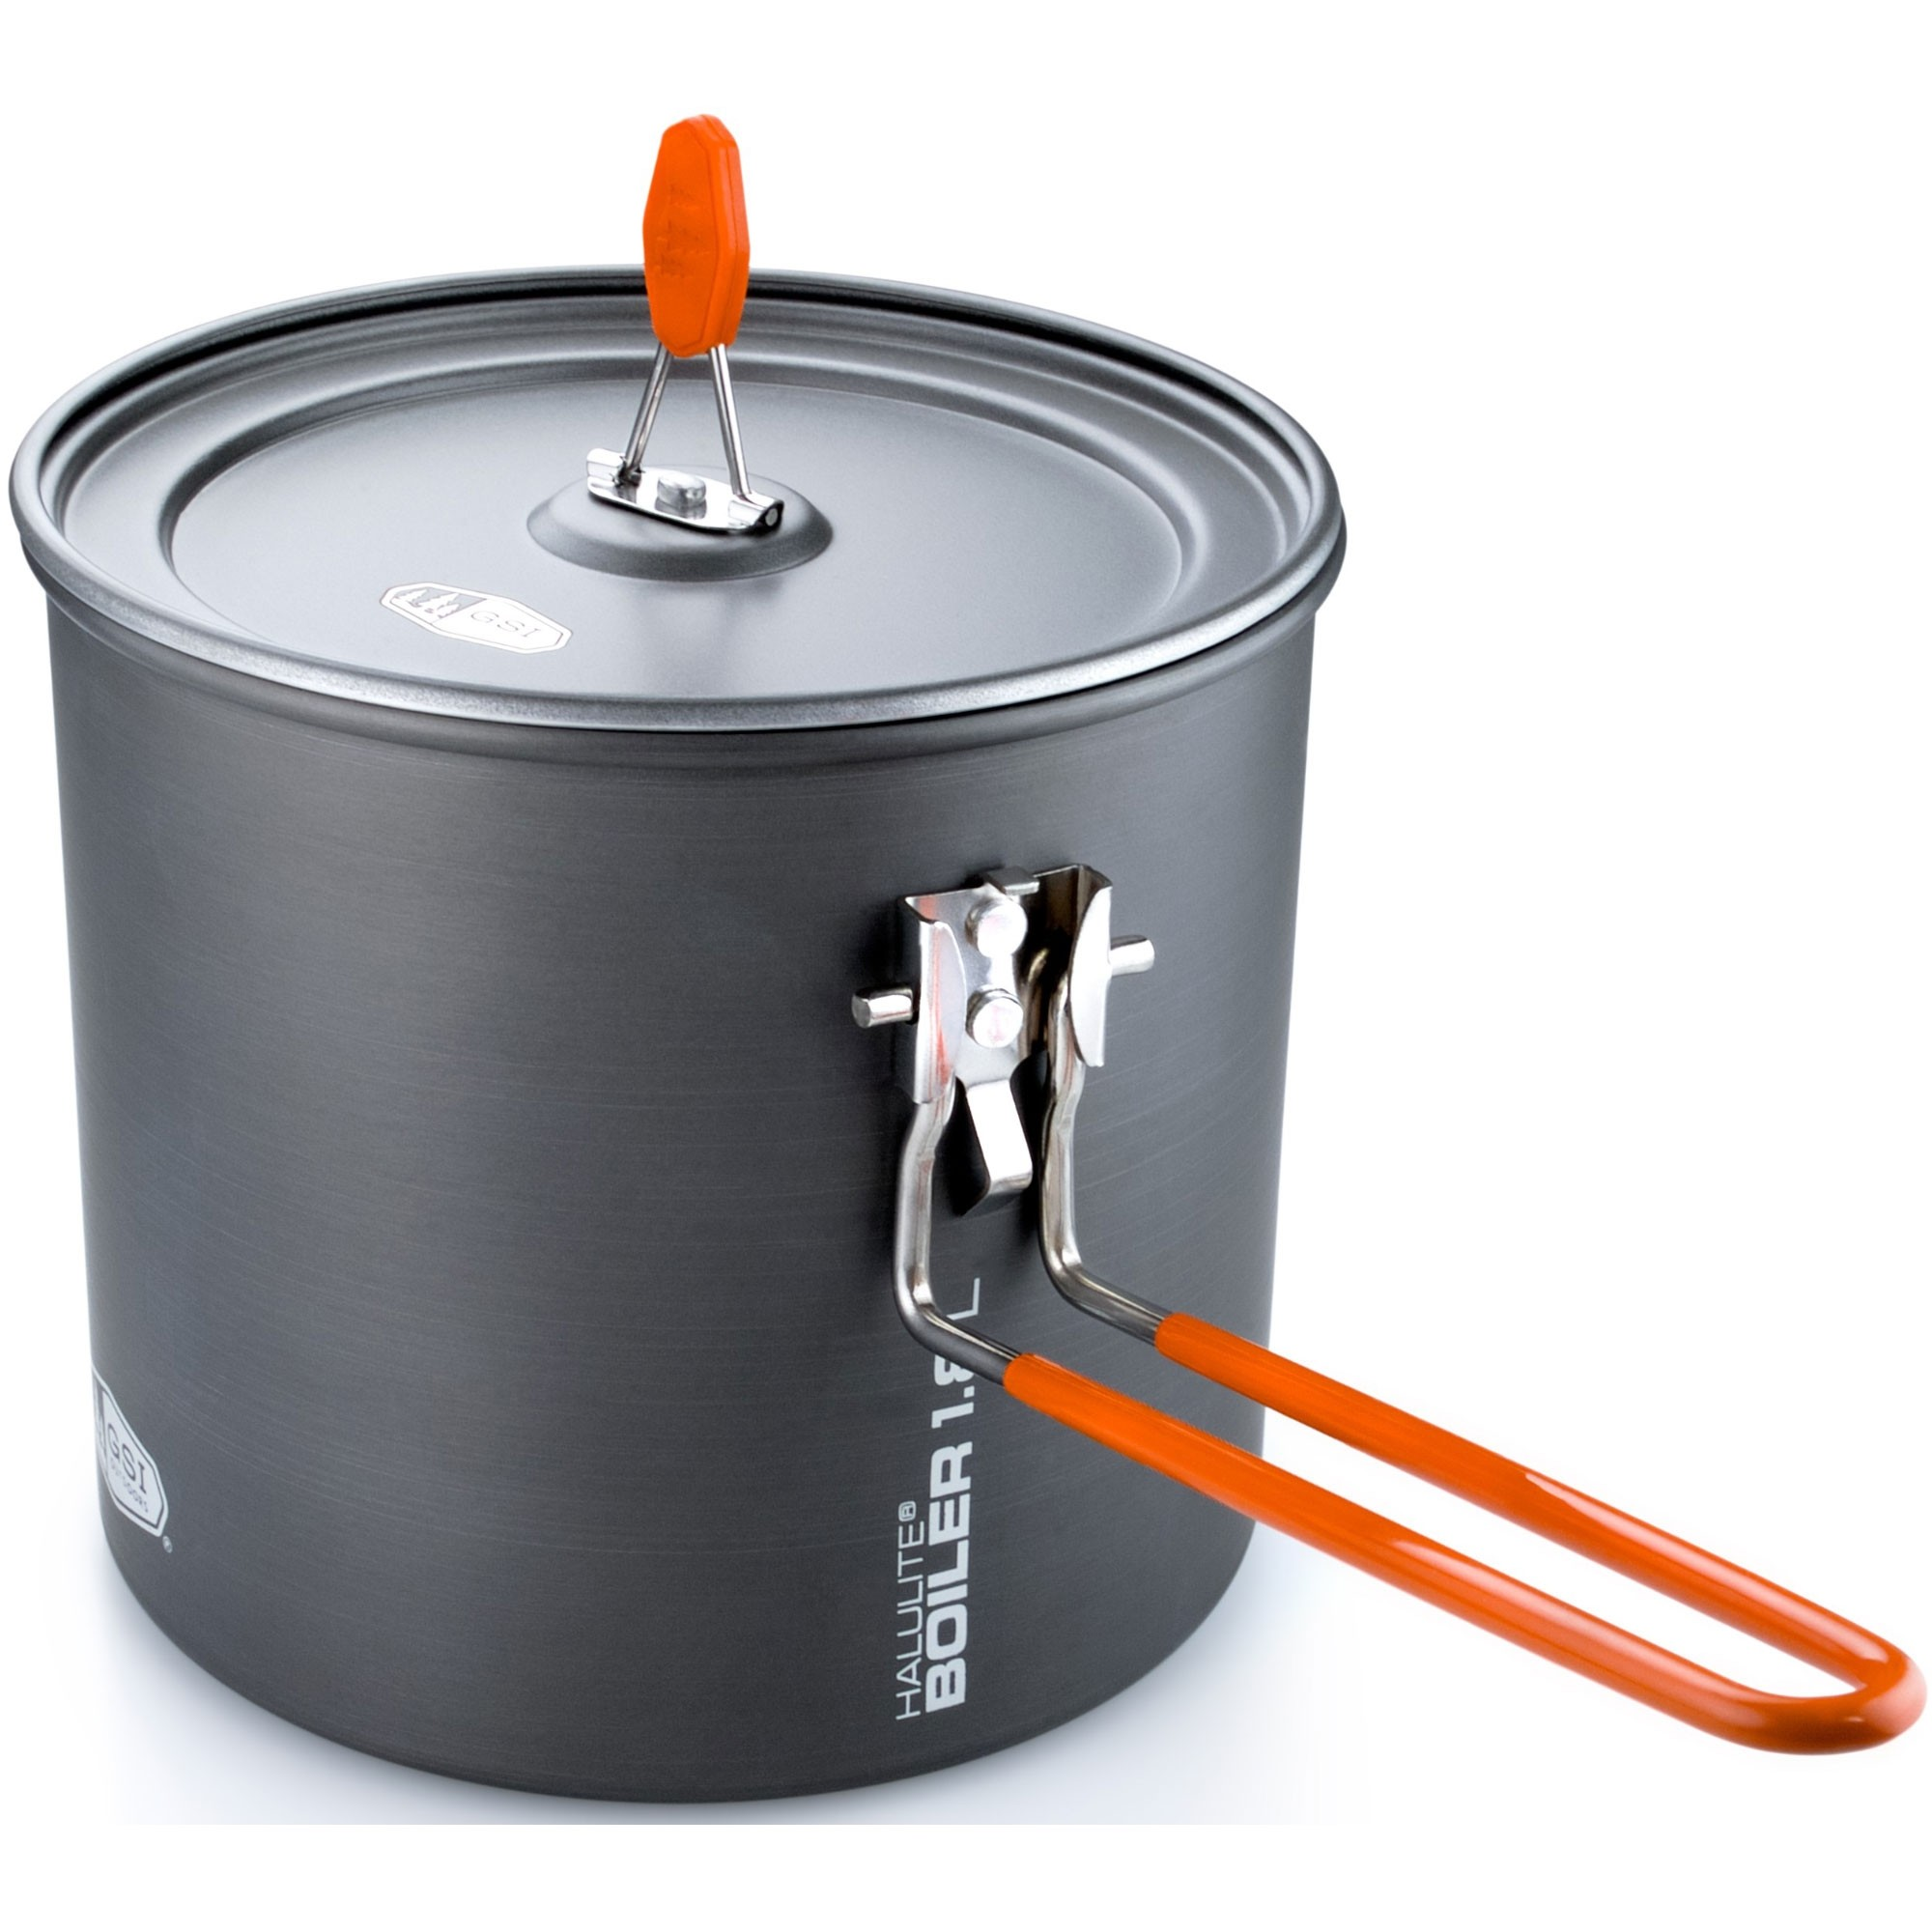 GSI Halulite Boiler 1.8l